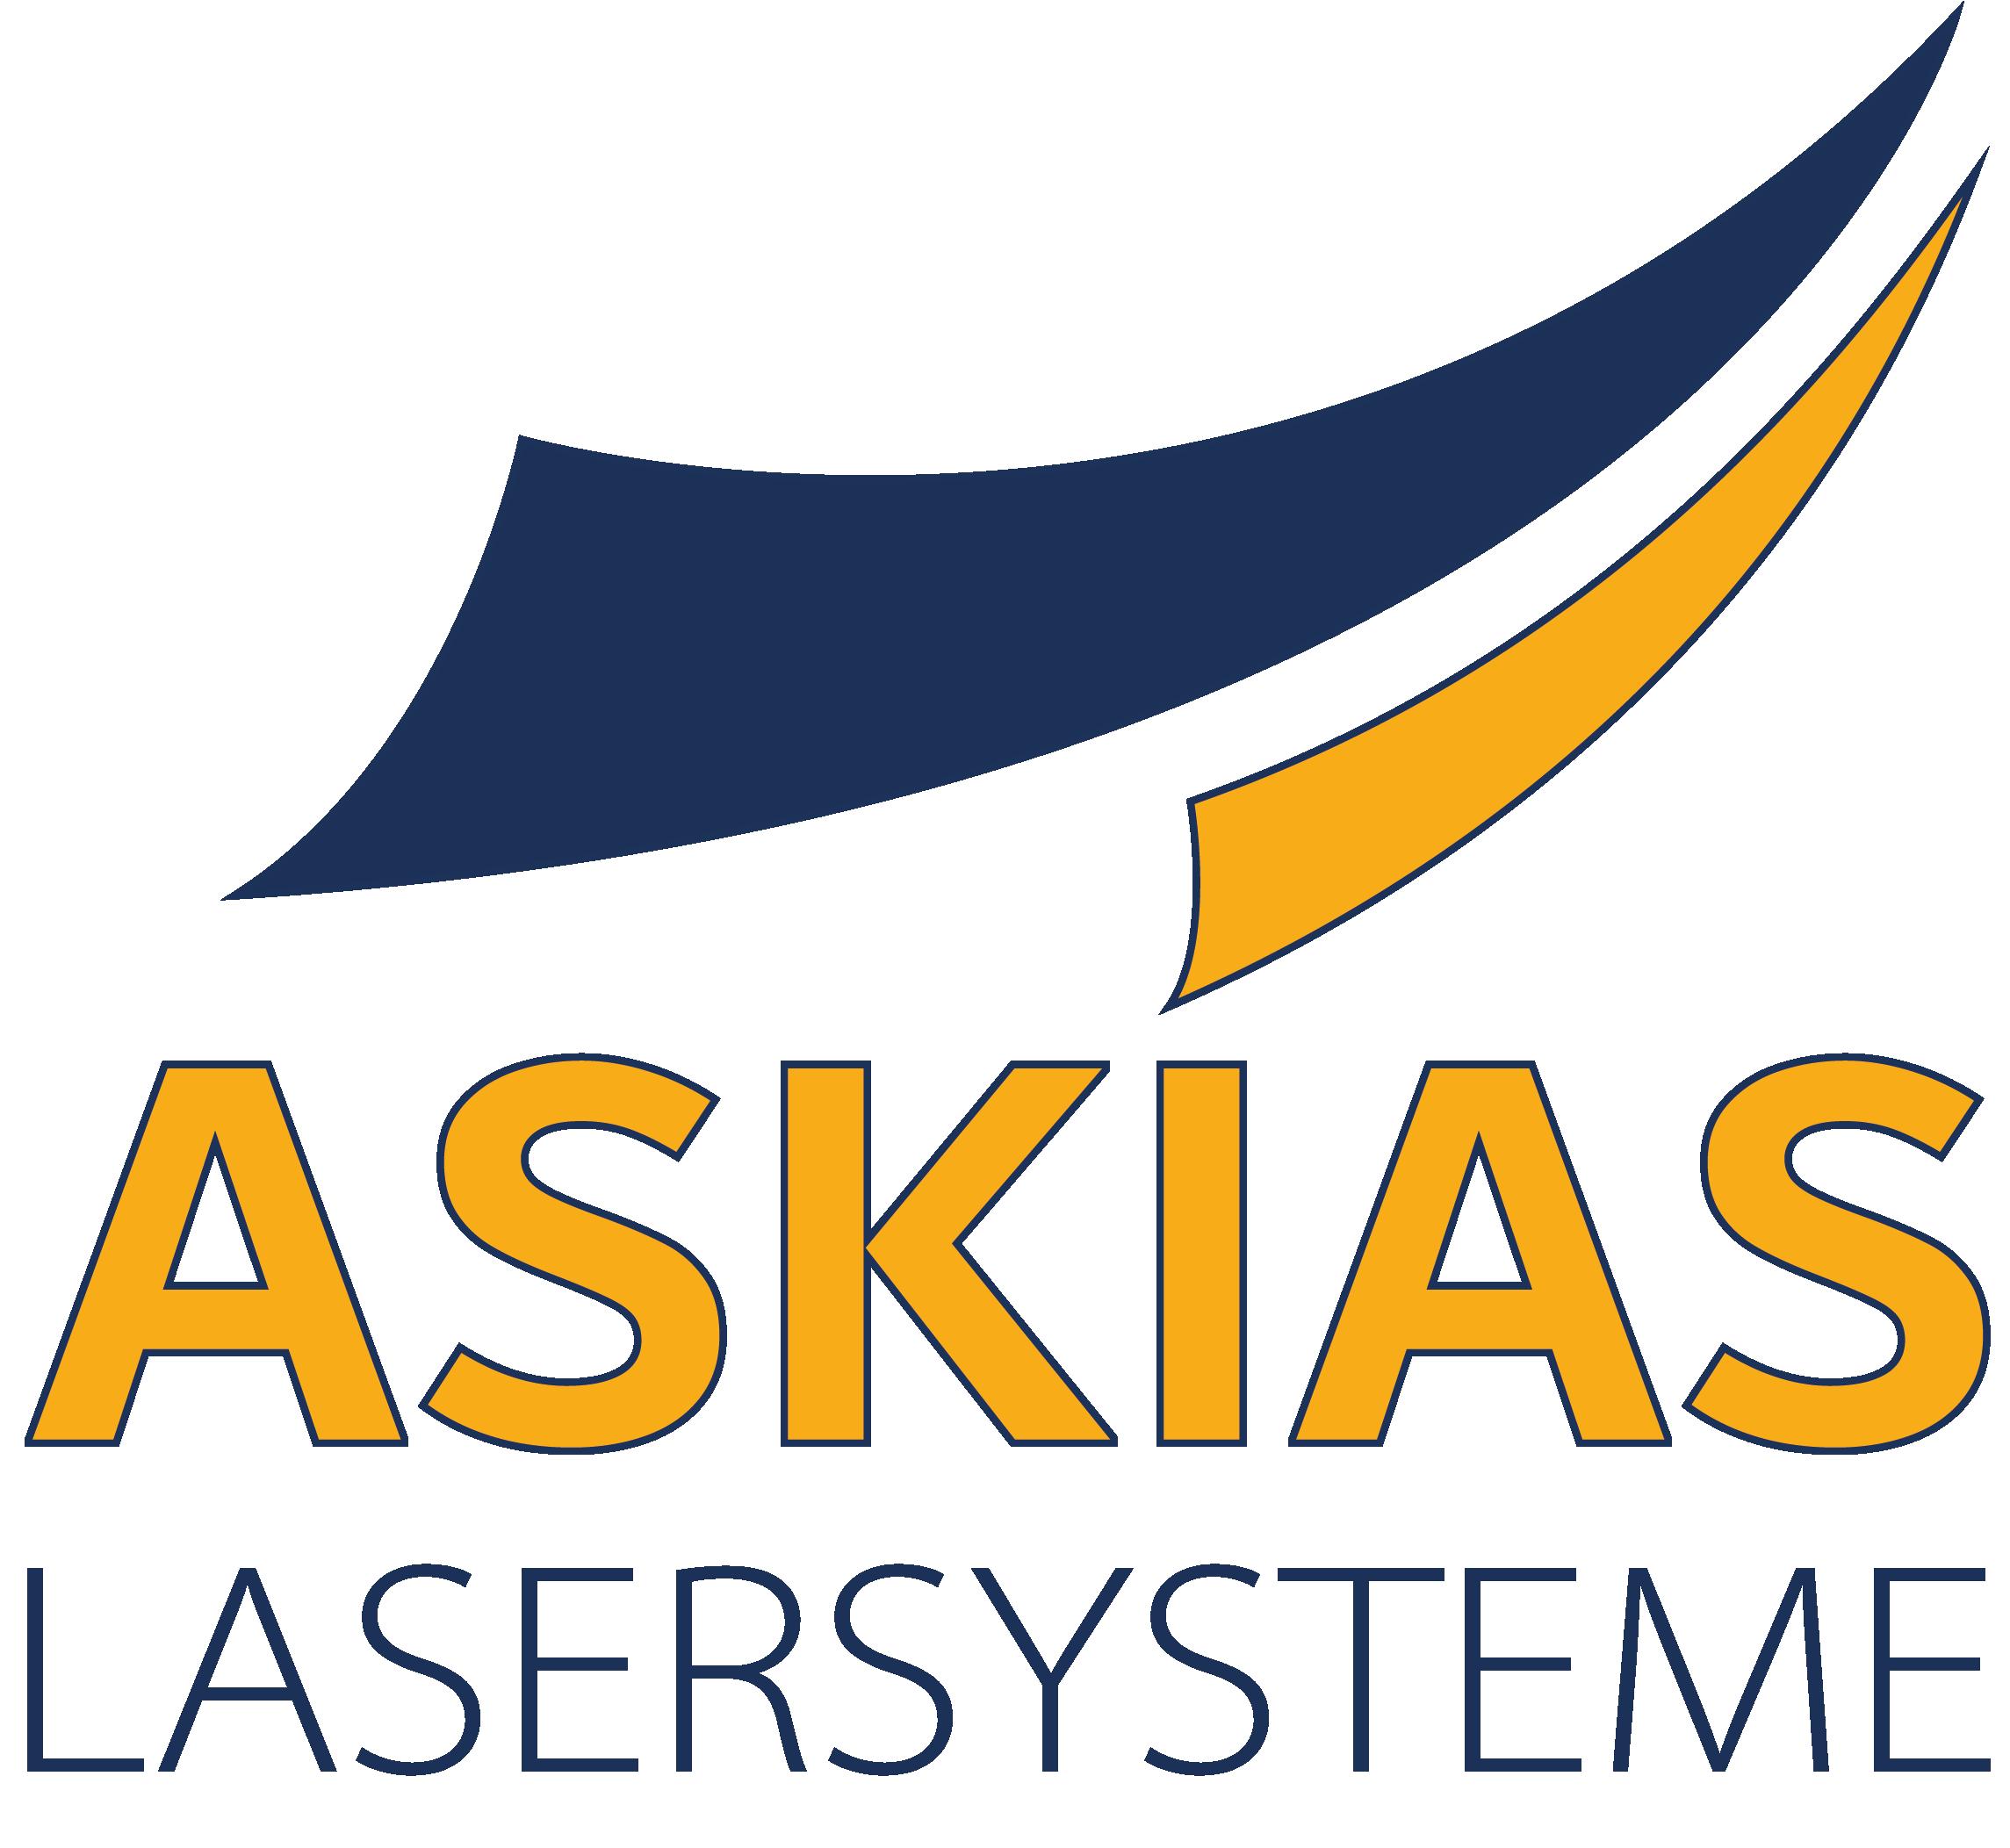 Logo ASKIAS Lasersysteme png